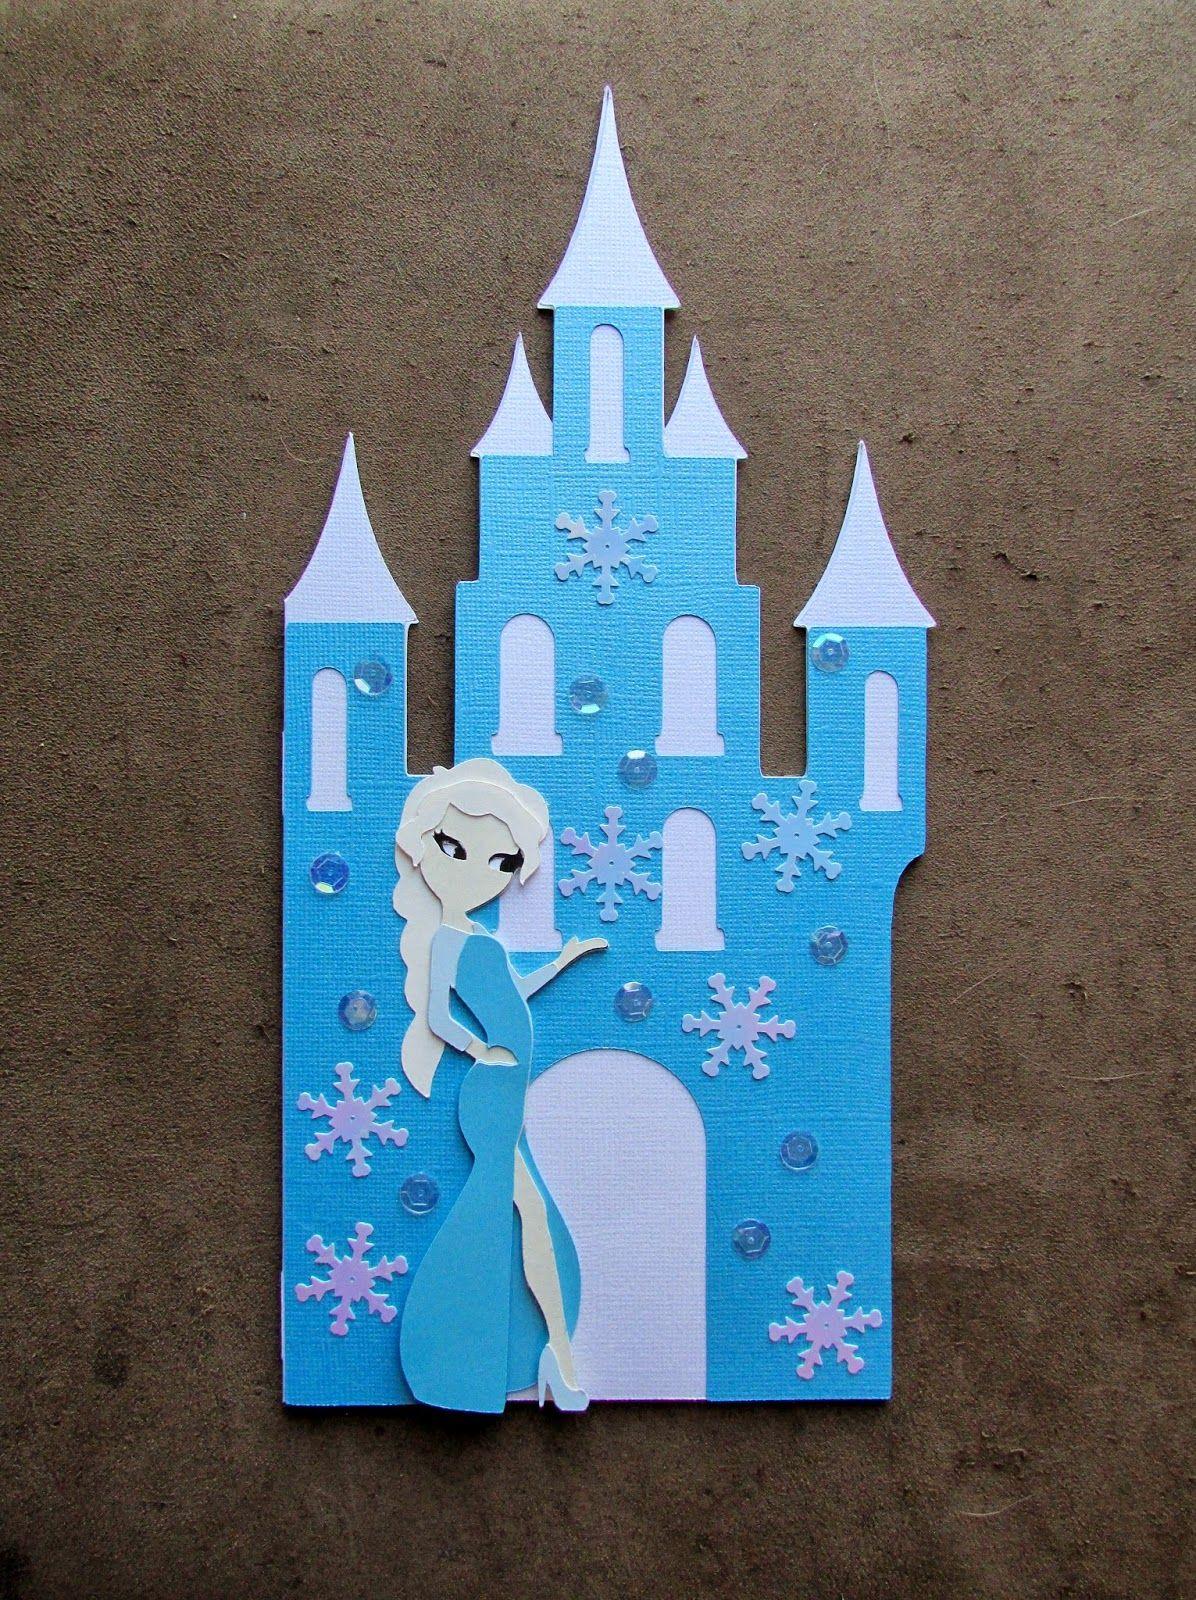 Carols Creations Disneys Frozen Elsa Inspired Birthday